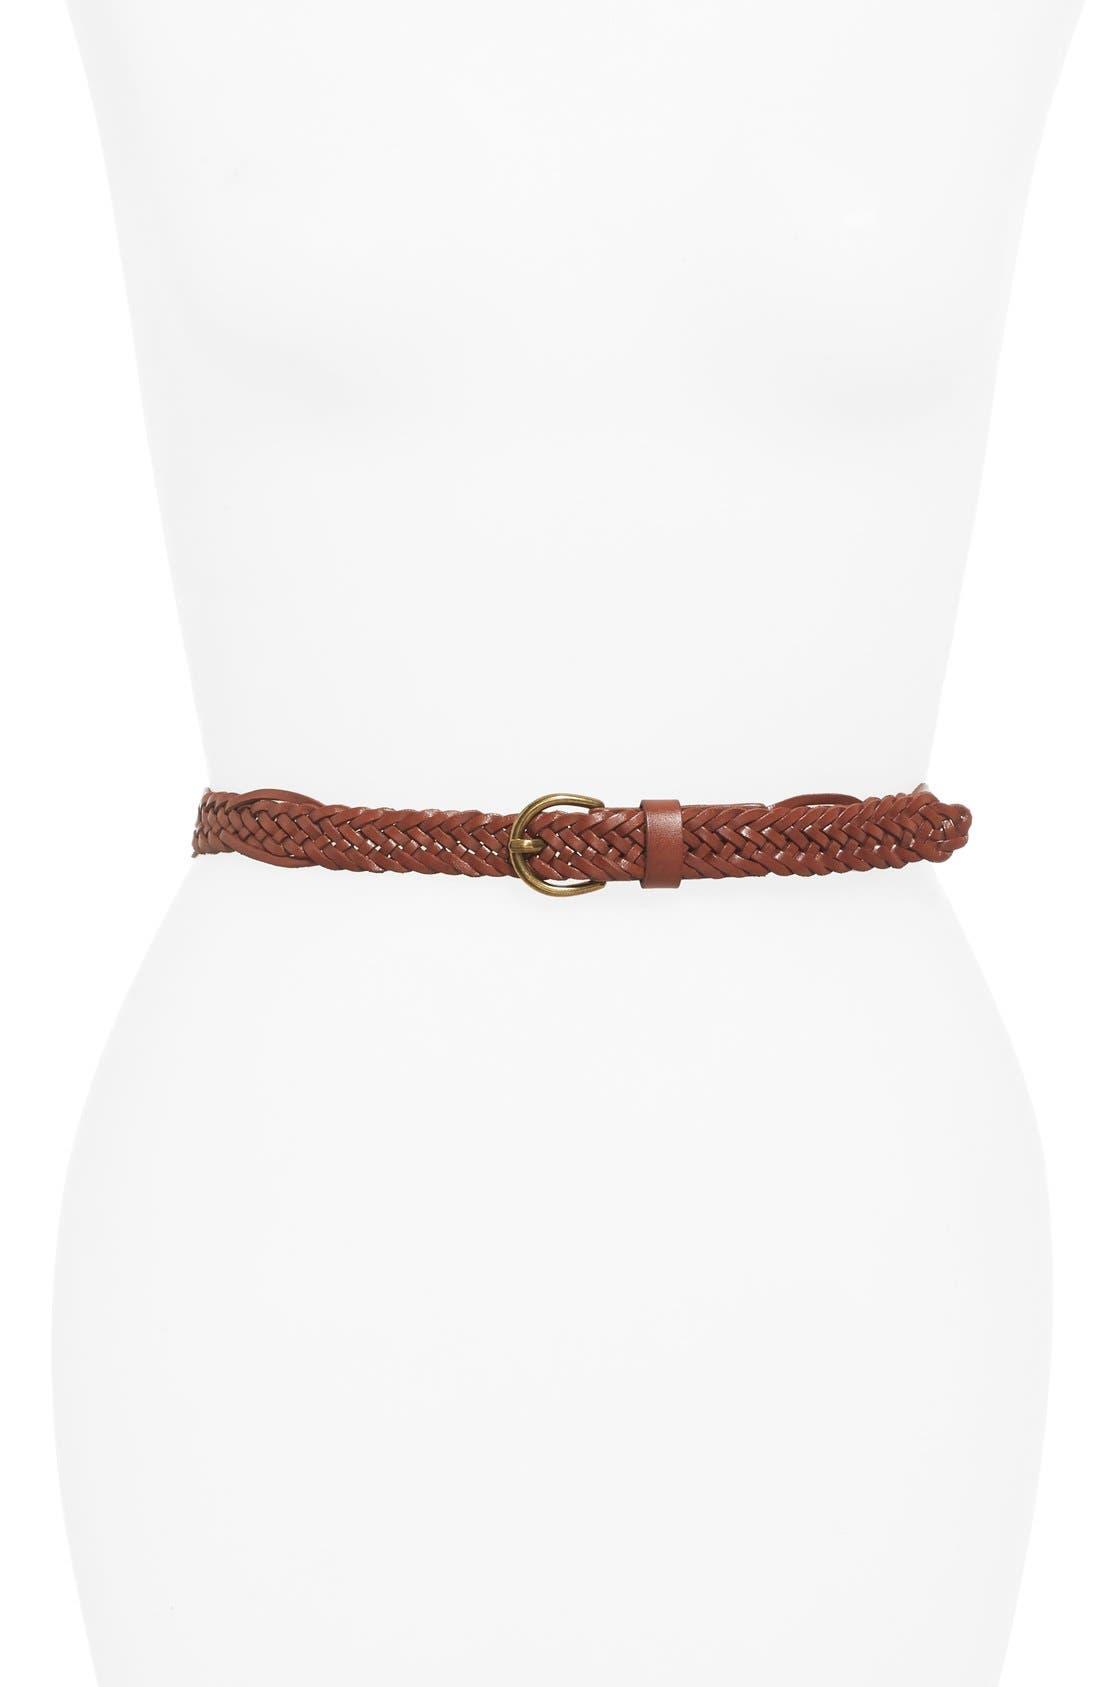 Skinny Braided Belt,                             Main thumbnail 1, color,                             210